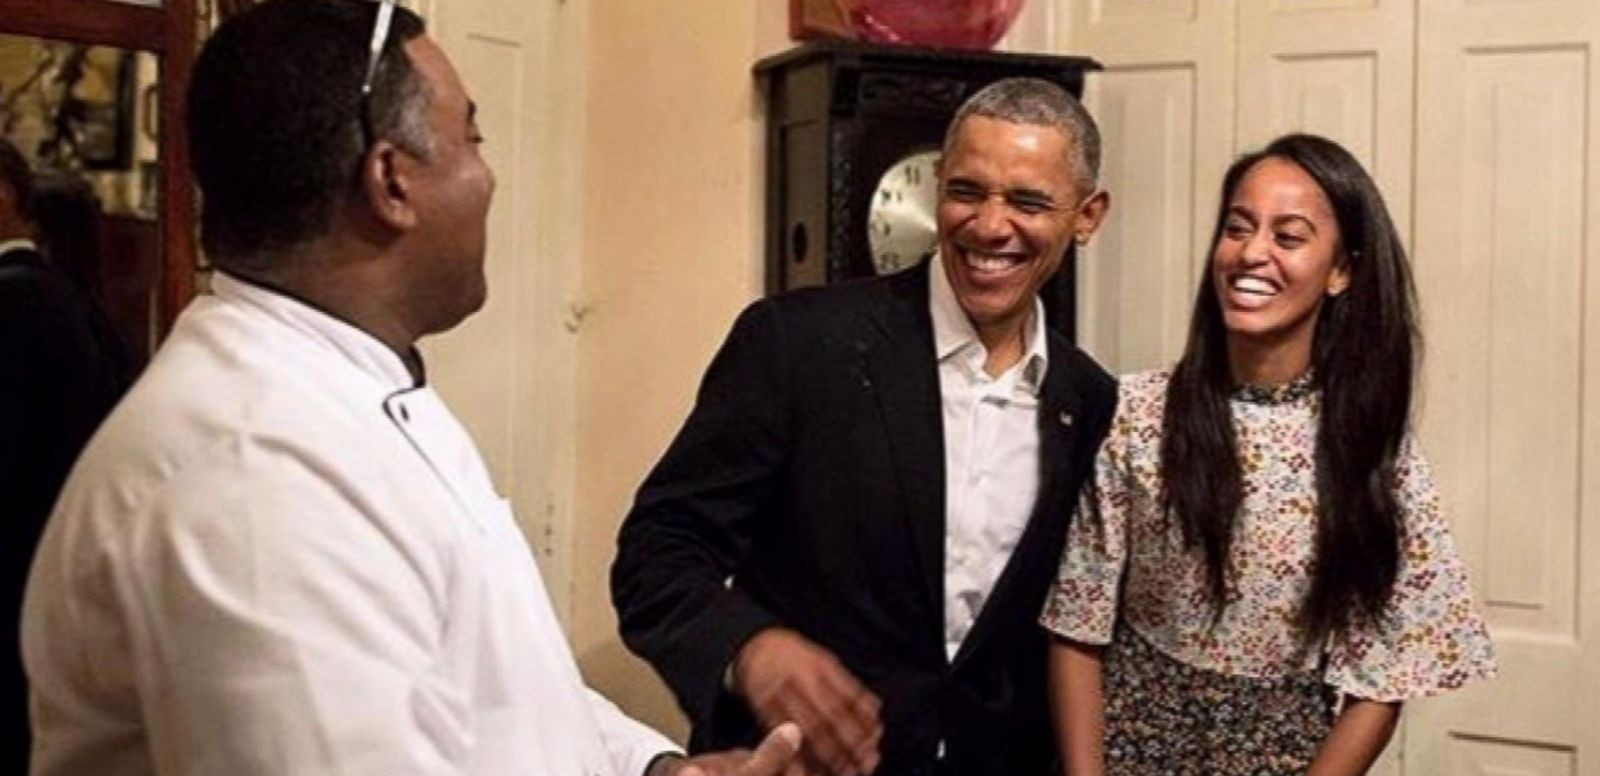 VIDEO: 2. Malia Obama Steps In for Dad